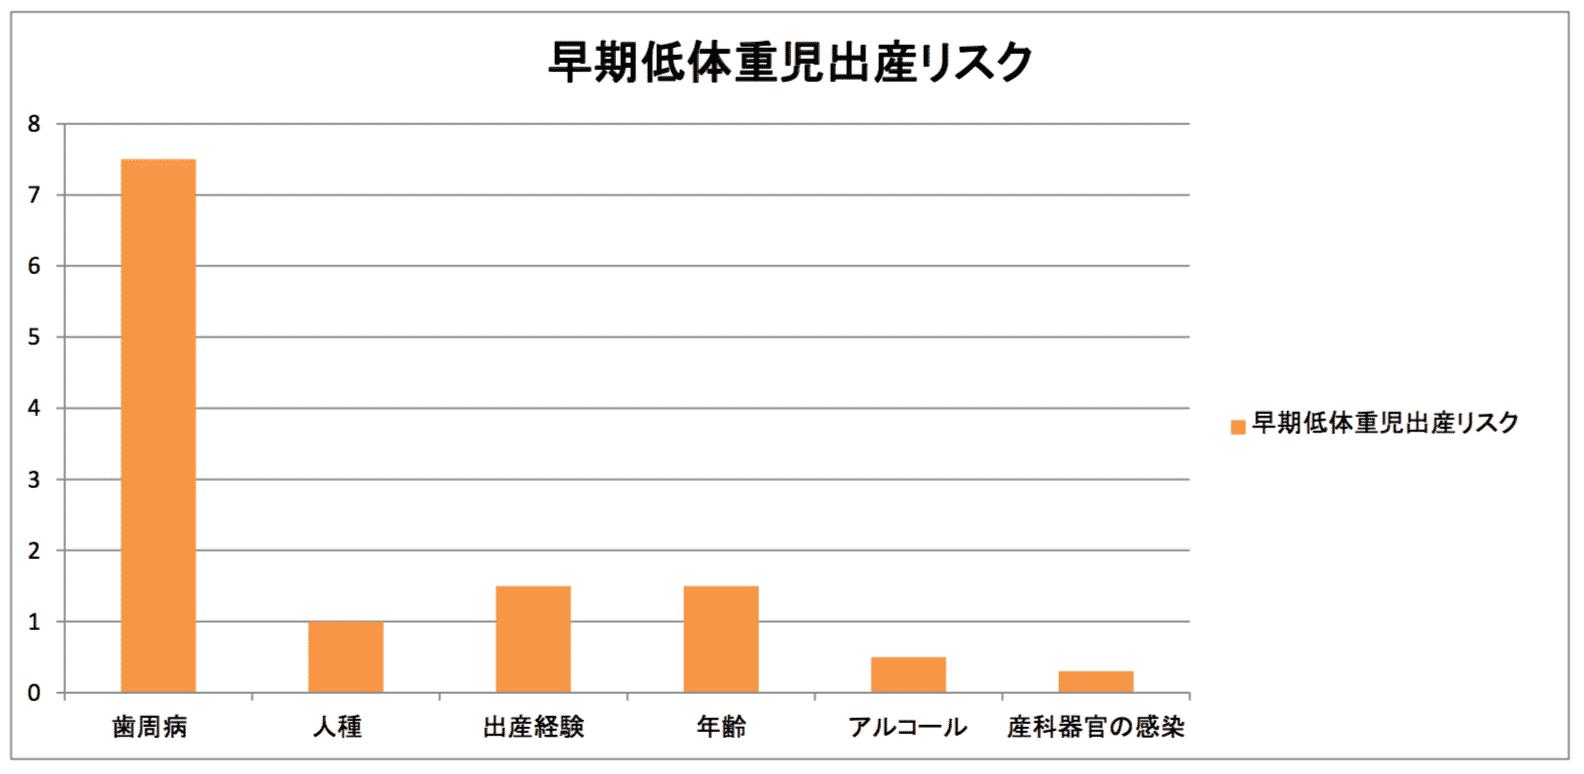 %e3%82%b9%e3%82%af%e3%83%aa%e3%83%bc%e3%83%b3%e3%82%b7%e3%83%a7%e3%83%83%e3%83%88-2016-11-18-17-01-10